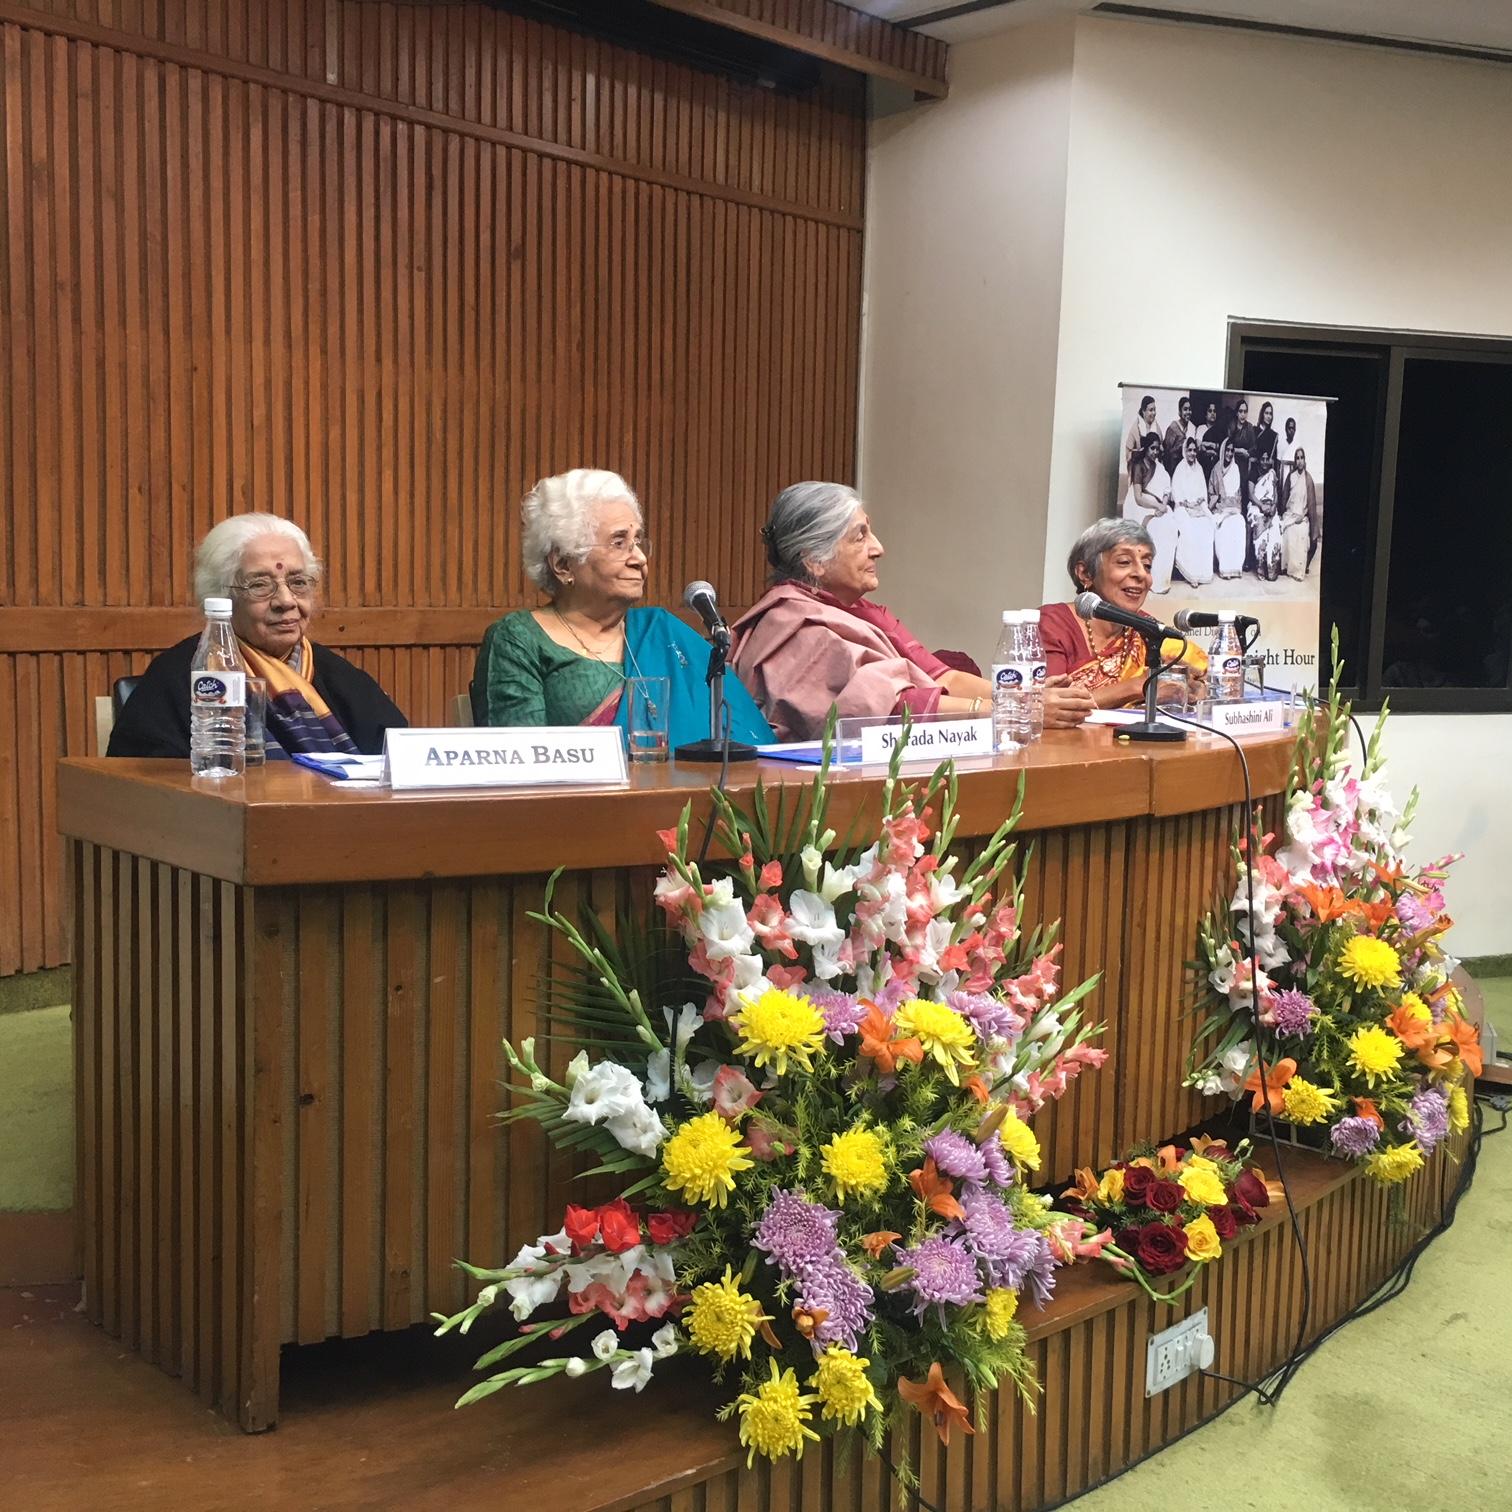 From left: Aparna Basu, Sharada Nayak, Subhashini Ali and Malavika Karlekar at the CWDS 2018 calendar launch at India International Centre Annexe. Credit: Amanat Khullar